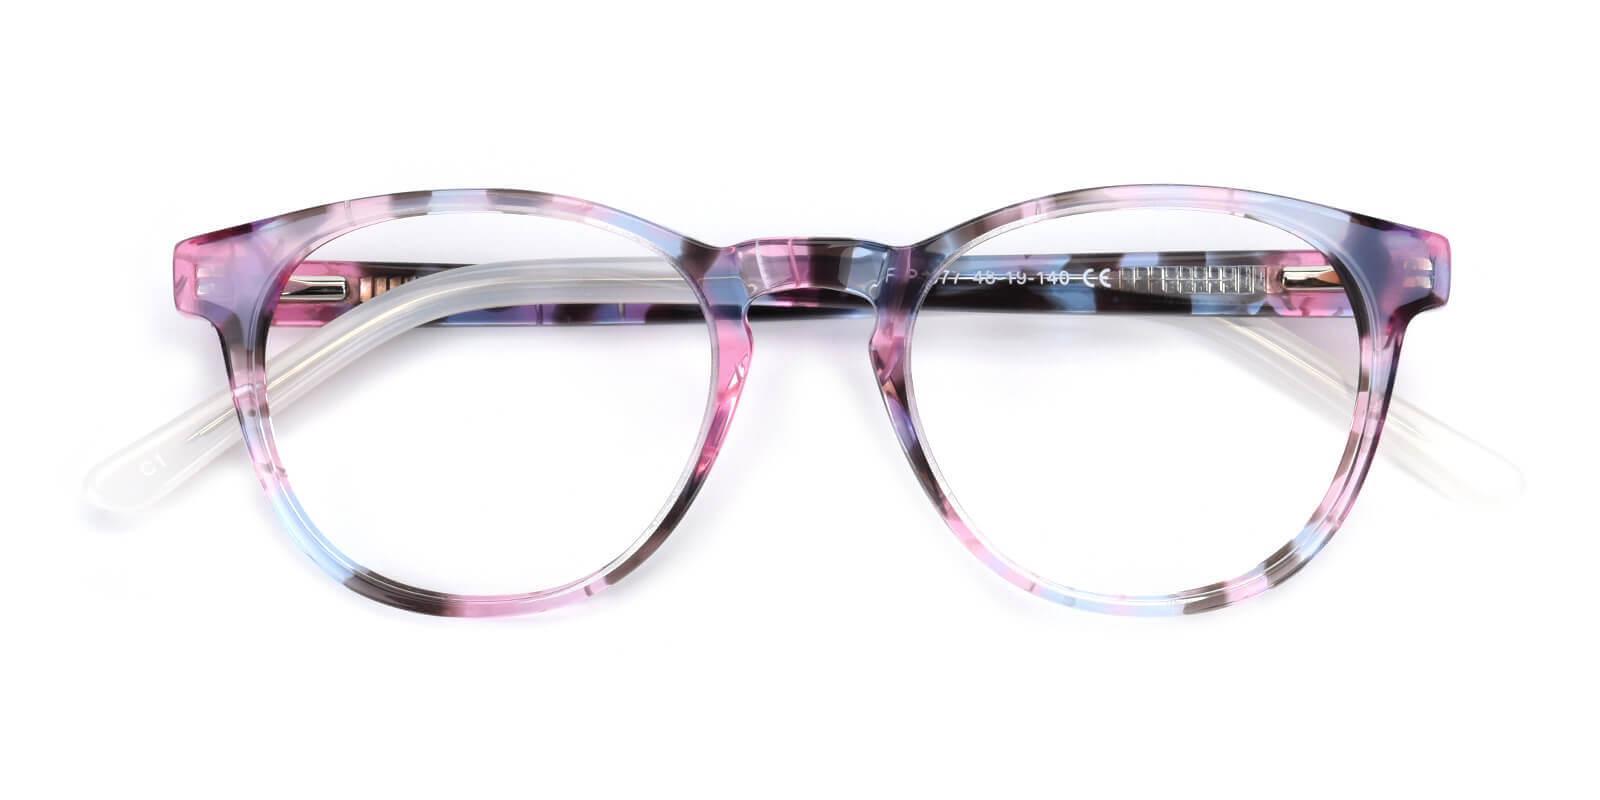 Debbine-Pink-Oval-Acetate-Eyeglasses-detail